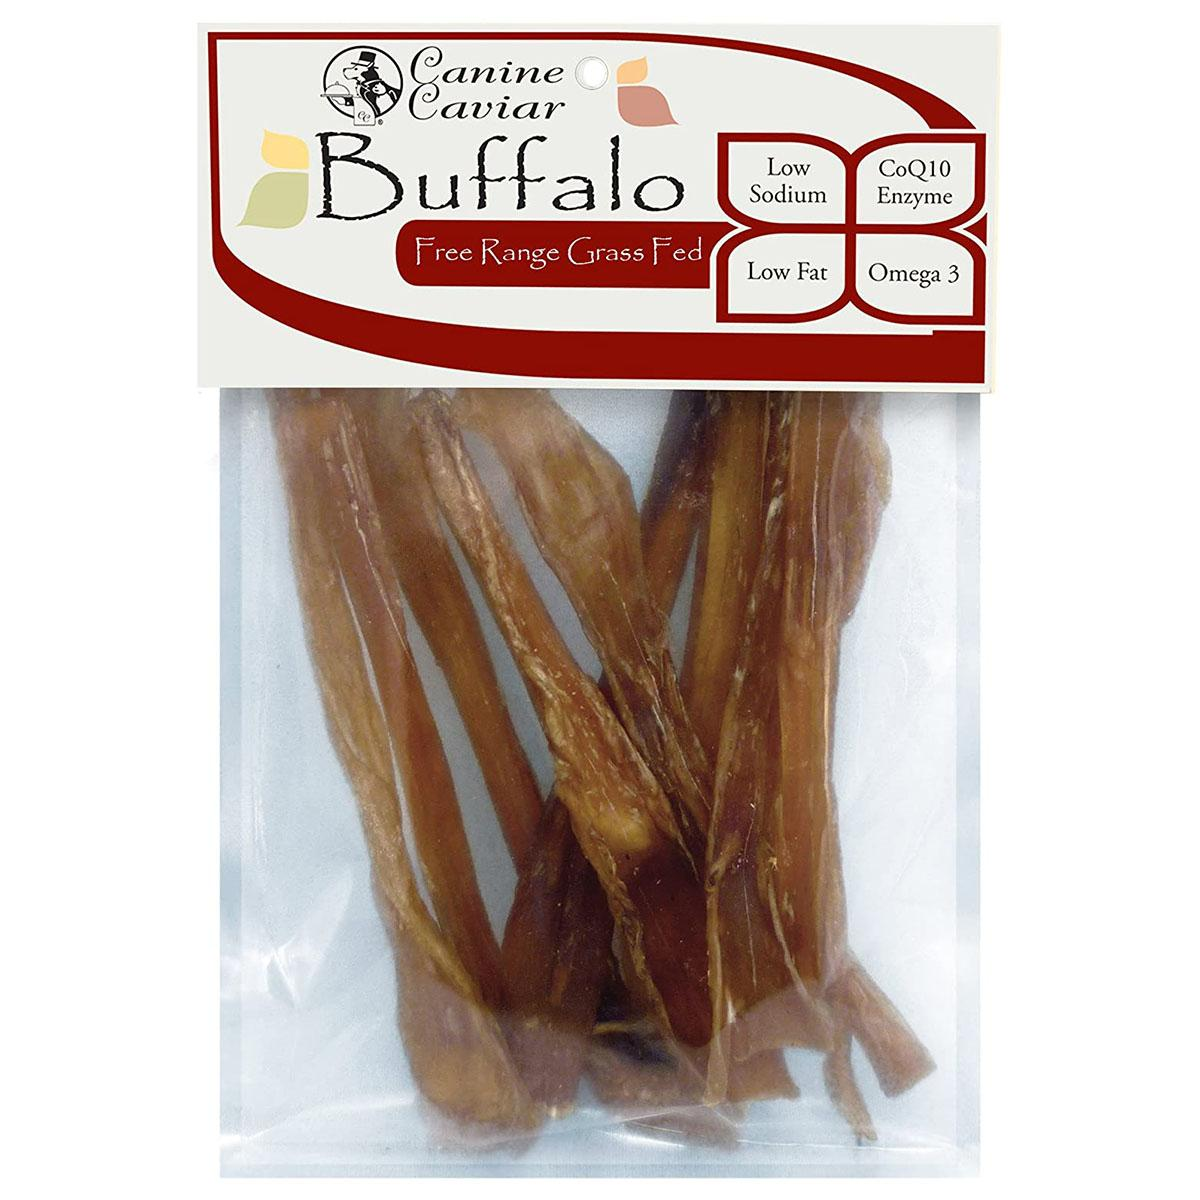 Canine Caviar Buffalo Tendon Toothpicks 6-Inch Dog Treats - 10-Pack